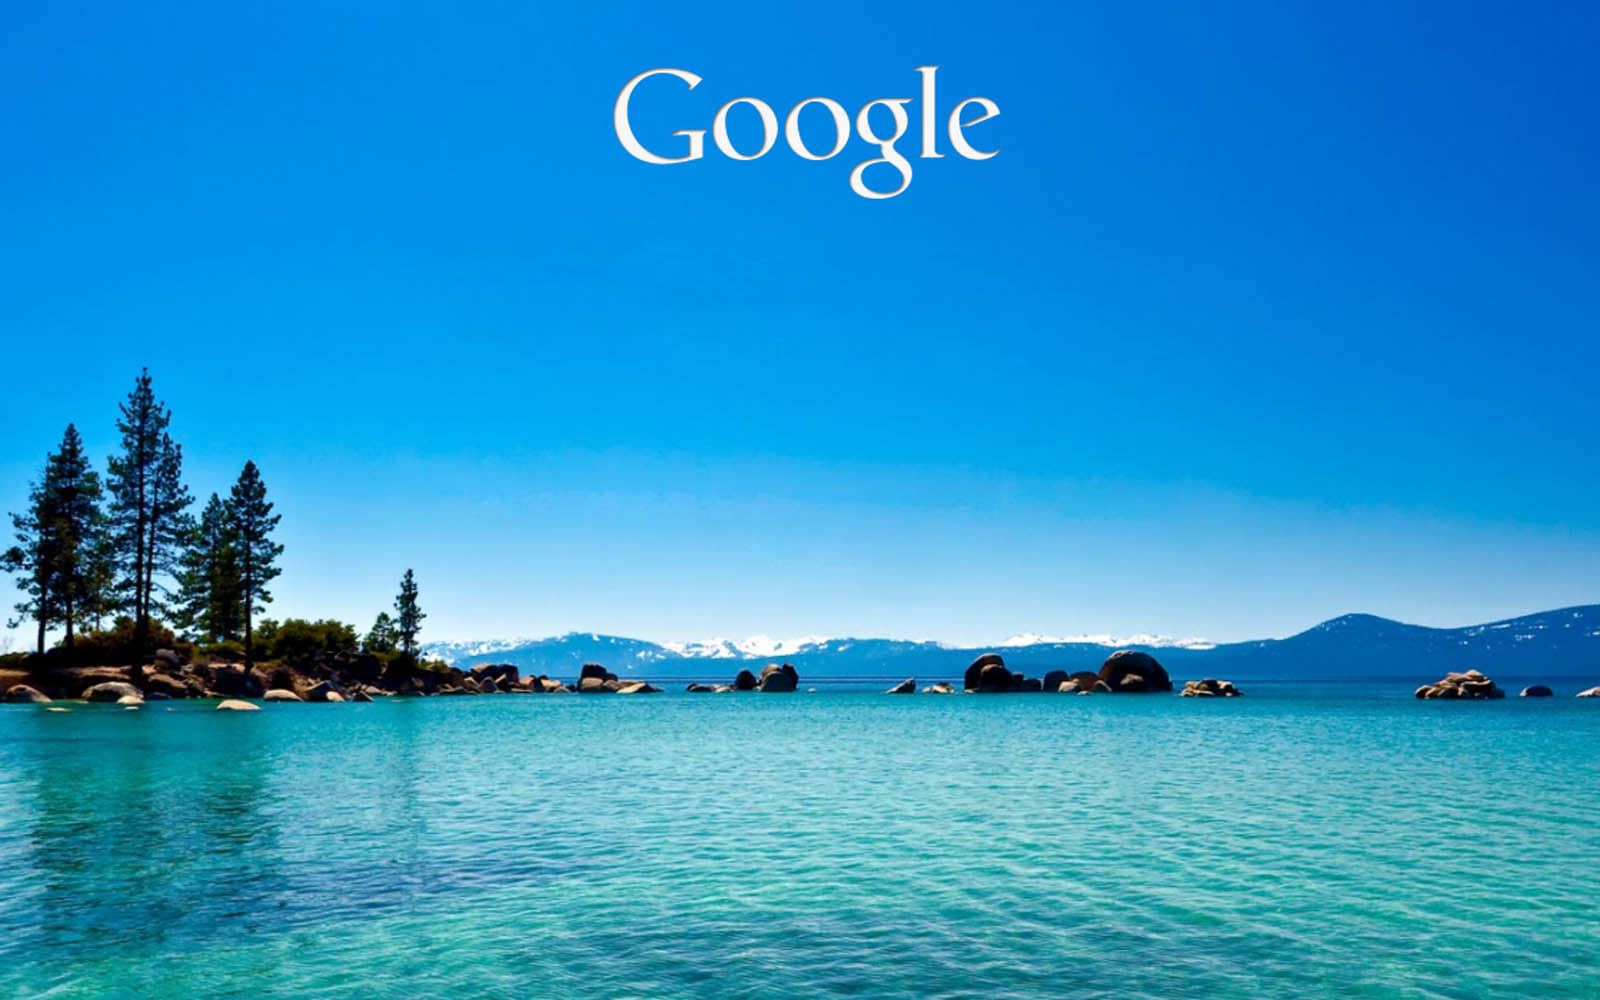 Google Background Wallpaper - WallpaperSafari